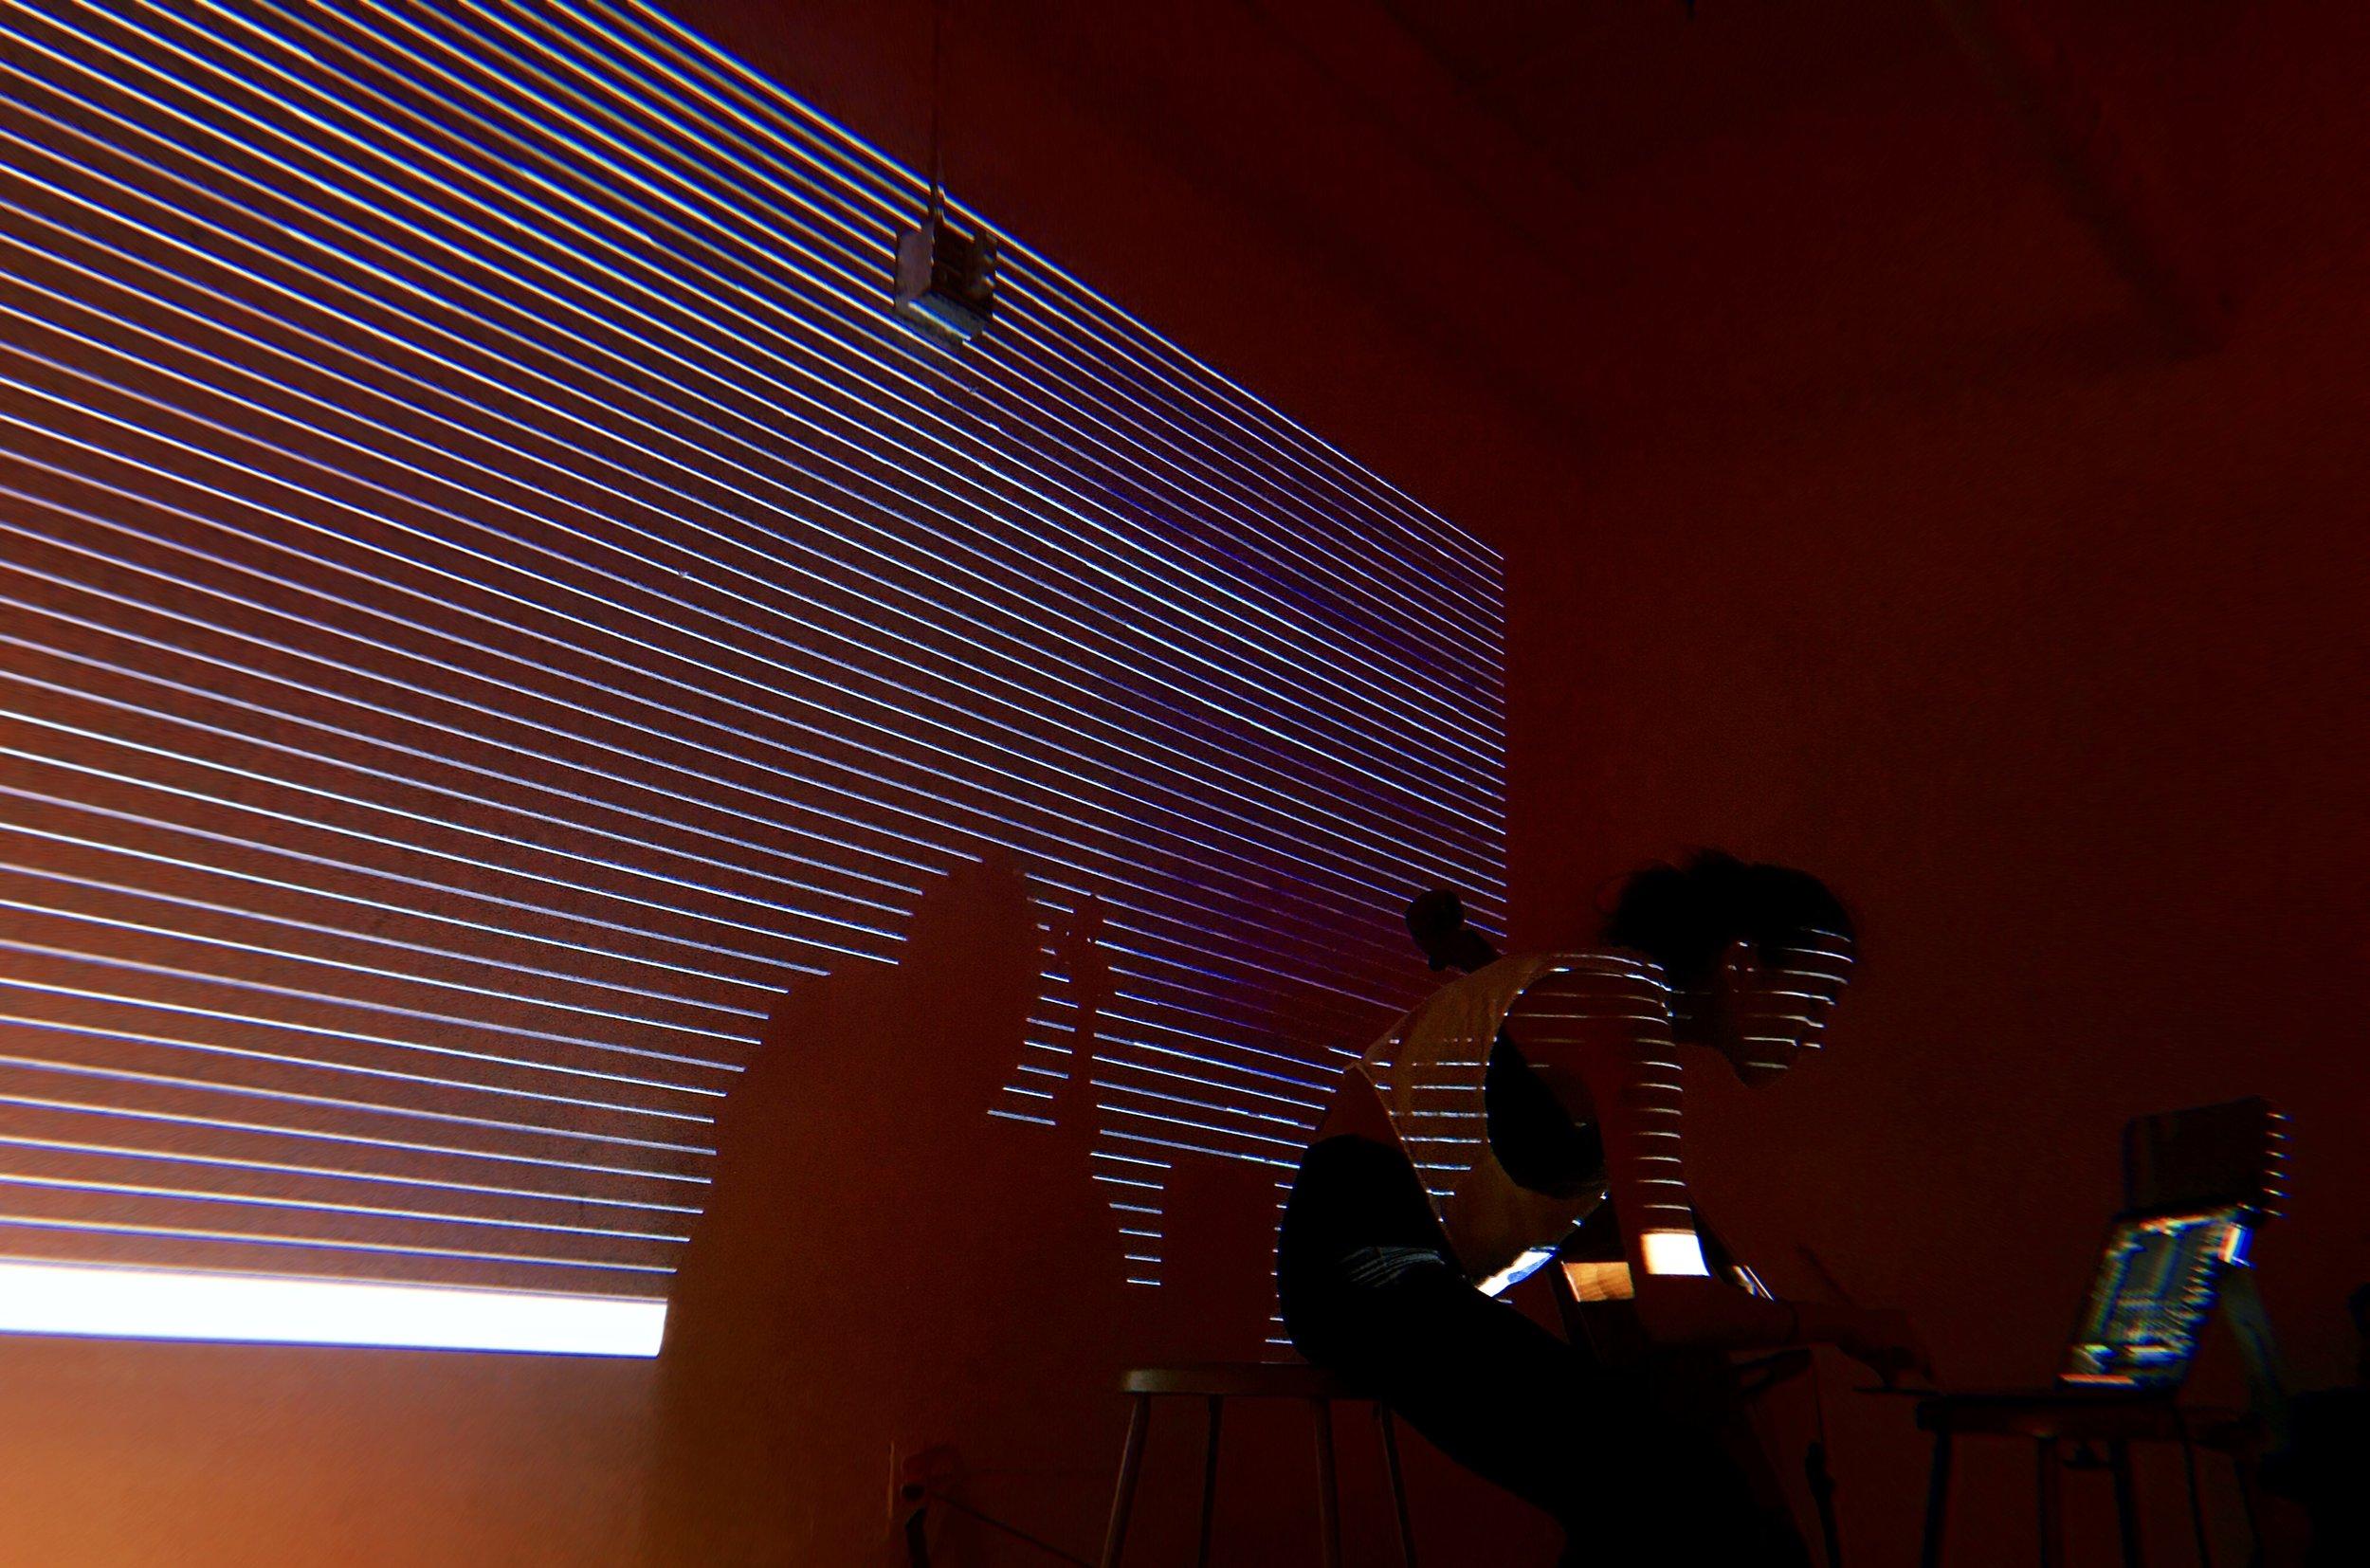 Jitter + cello improvisation + Ableton. 2018. Parsons School of Design.